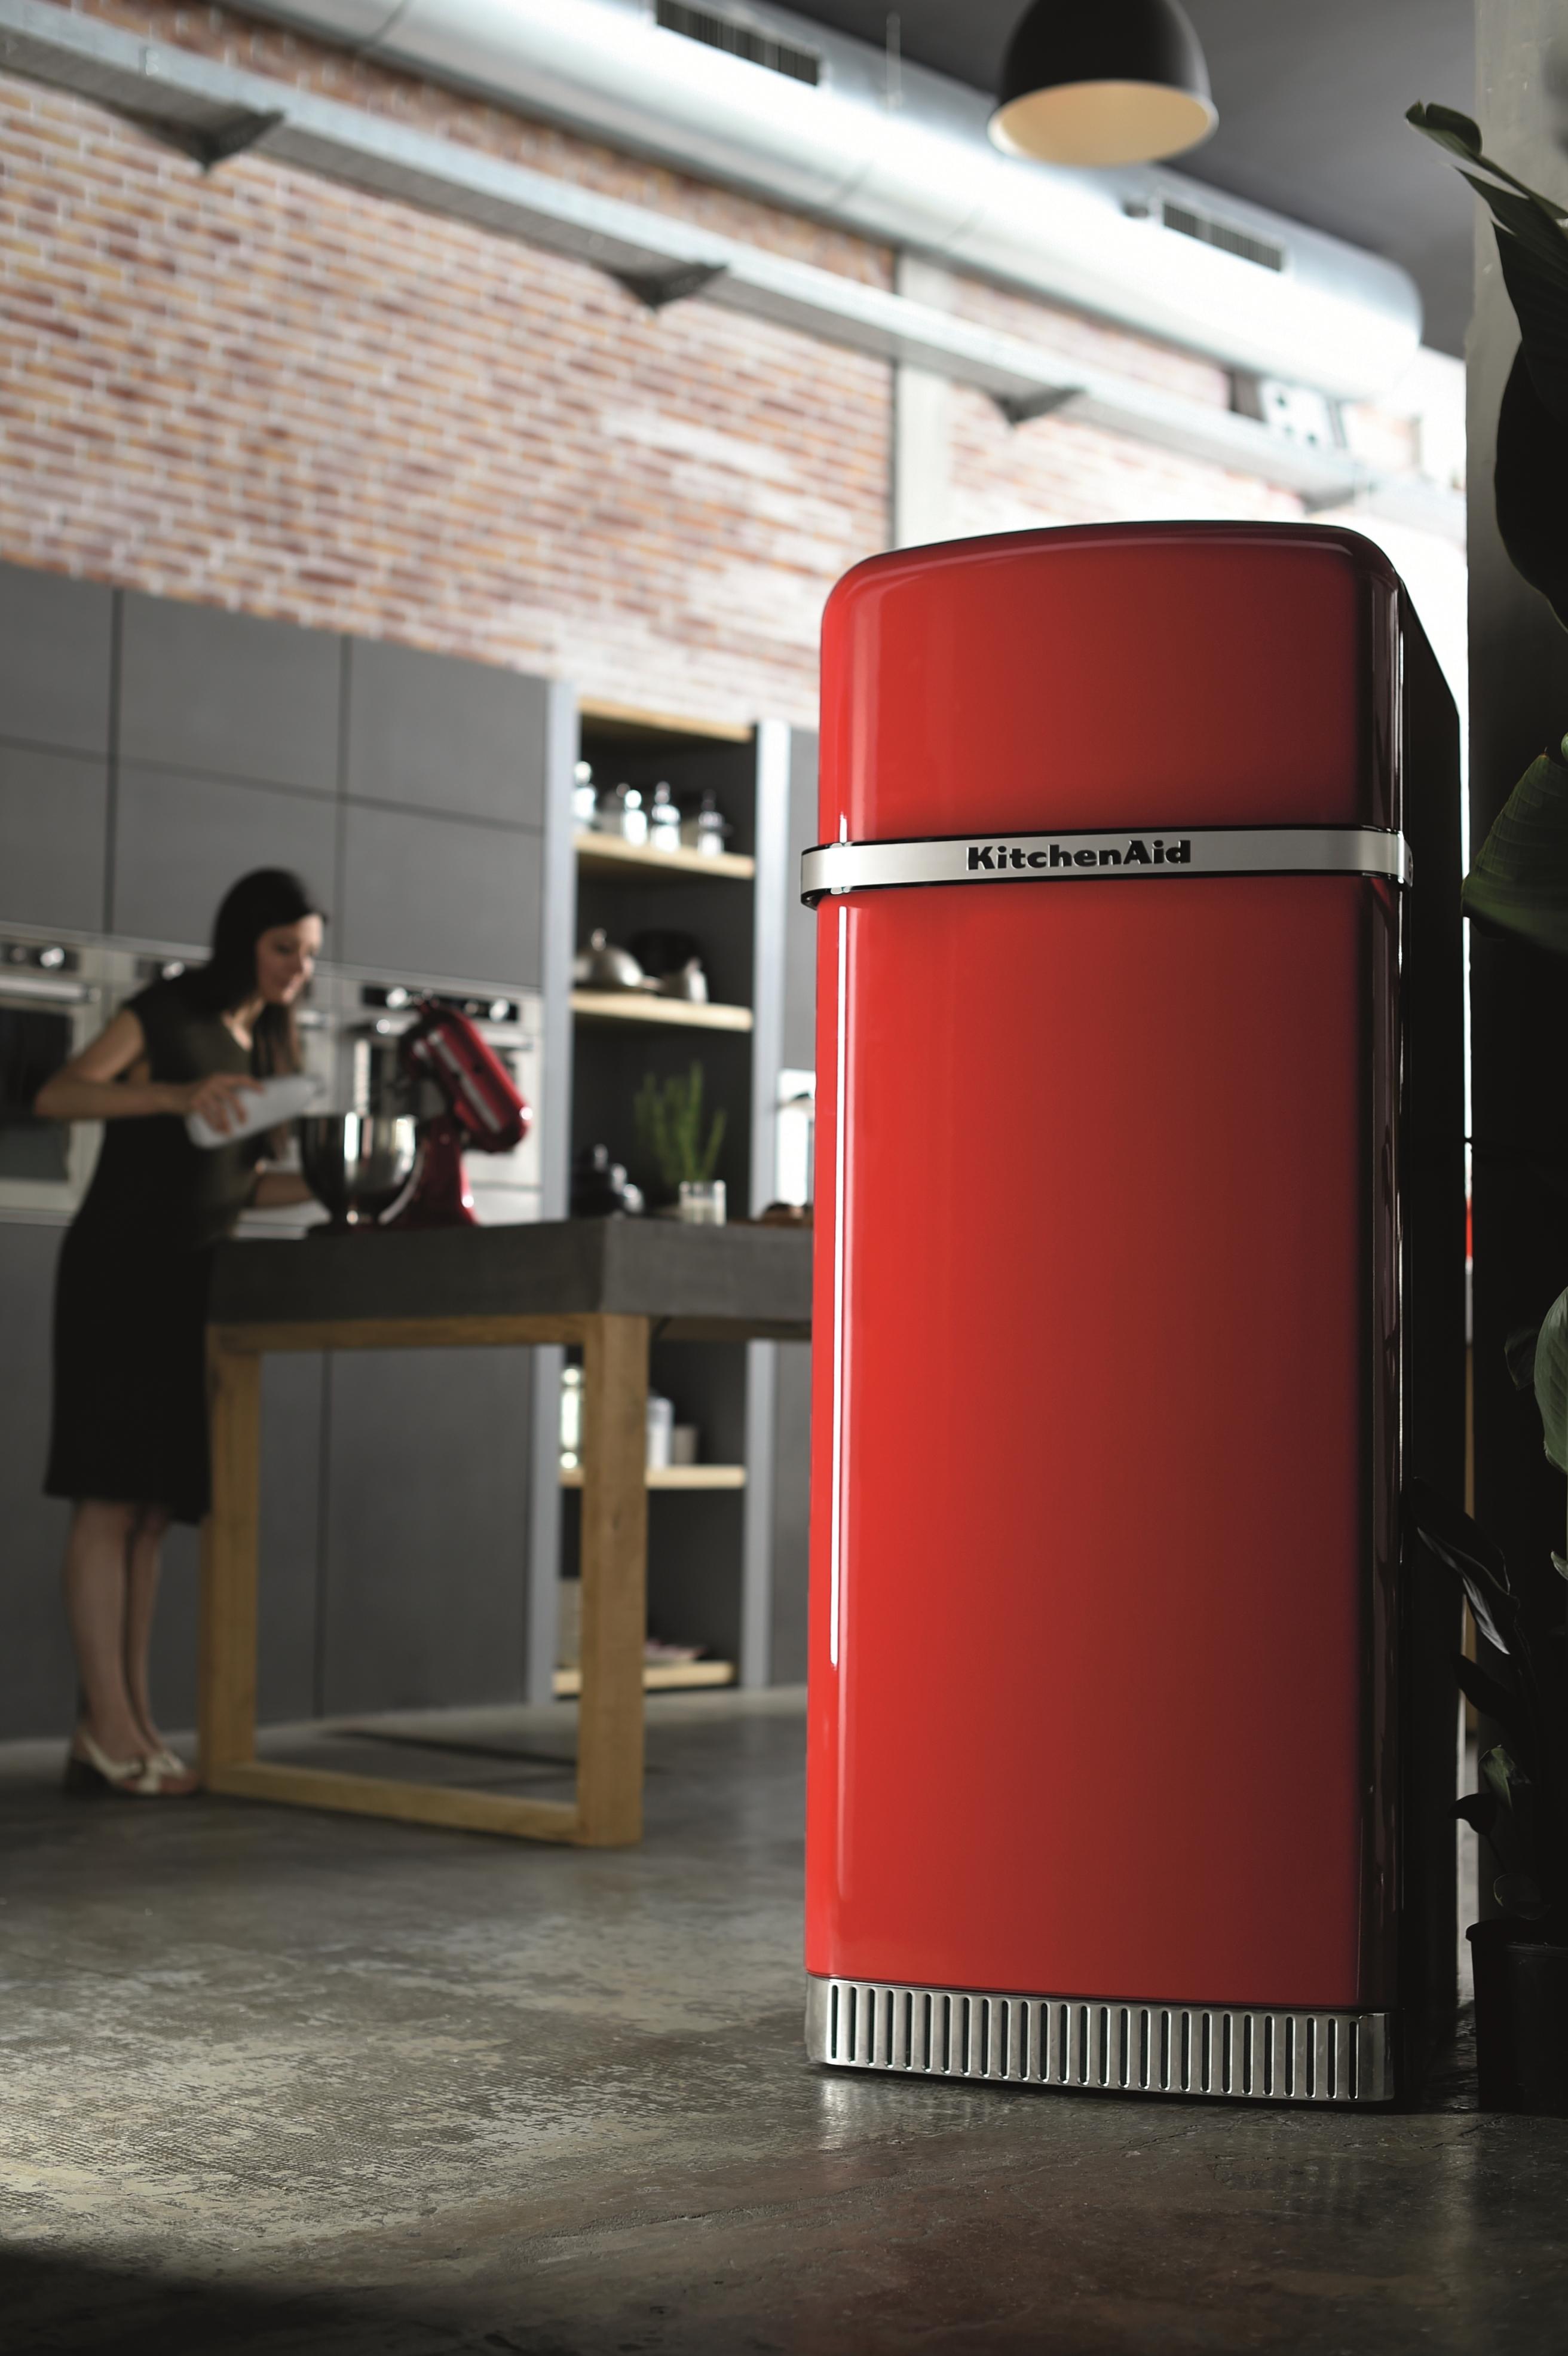 Iconic Fridge A New Icon By KitchenAid Home Appliances